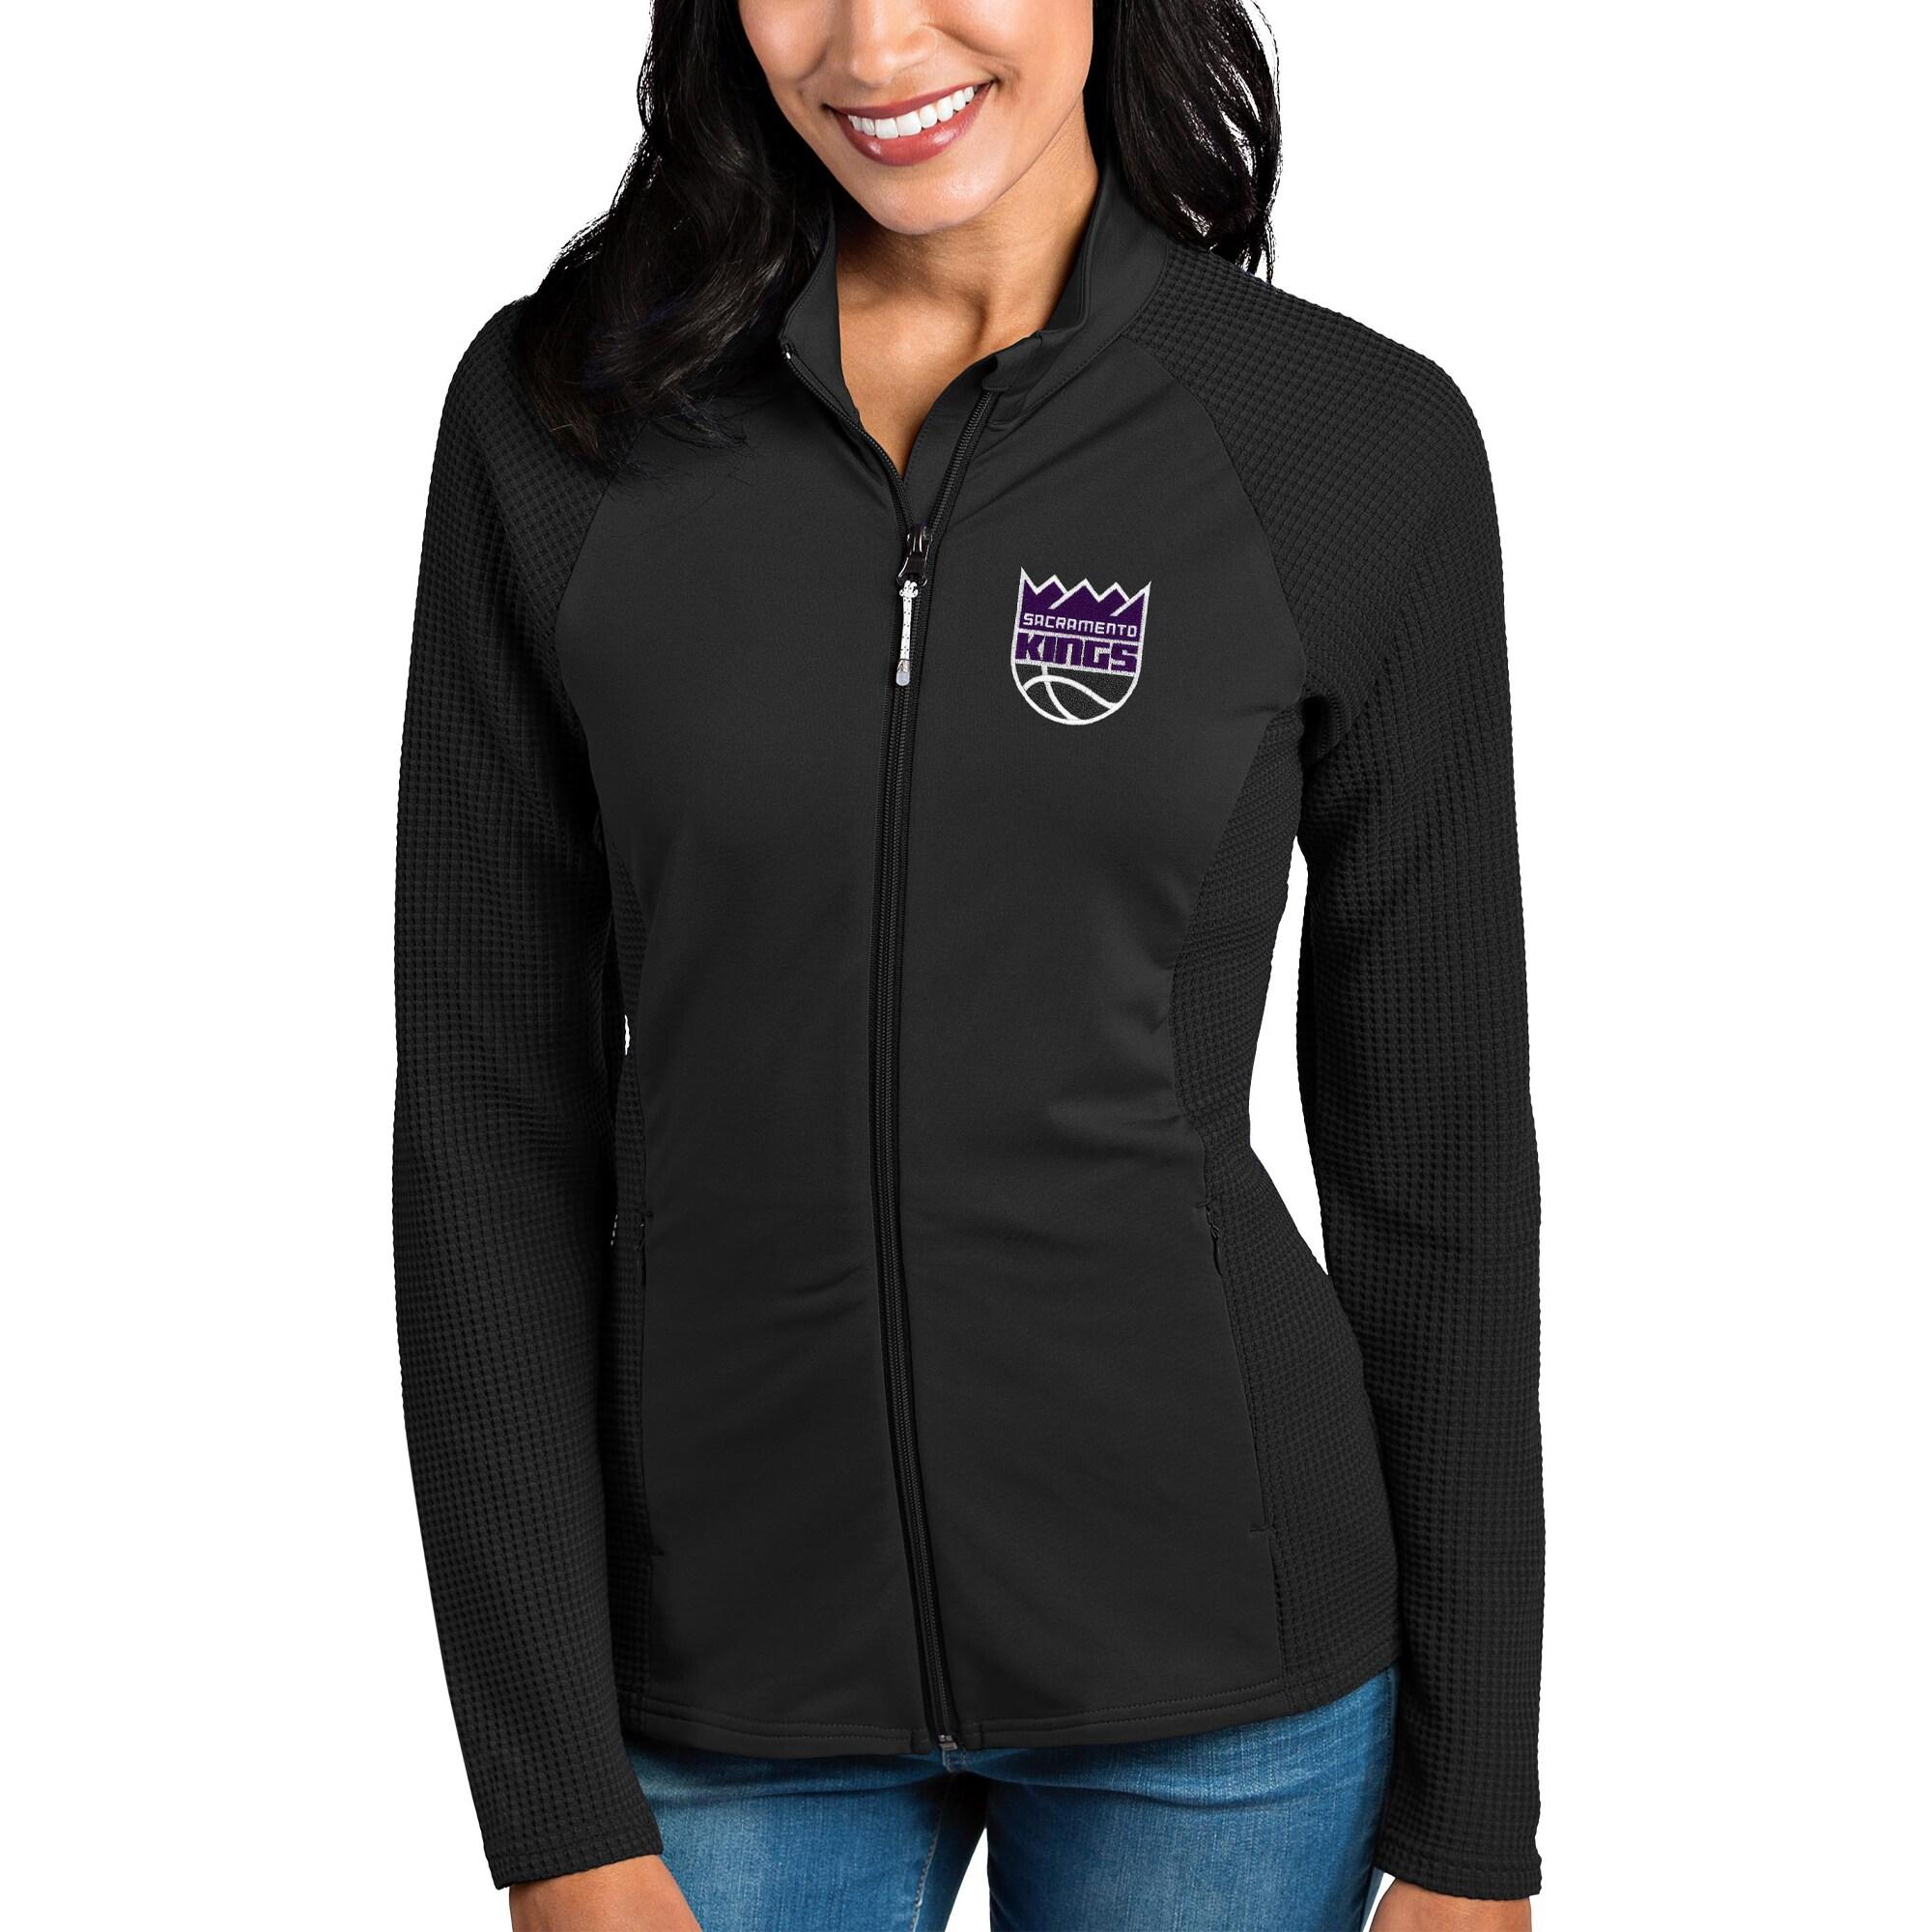 Sacramento Kings Antigua Women's Sonar Full-Zip Jacket - Black